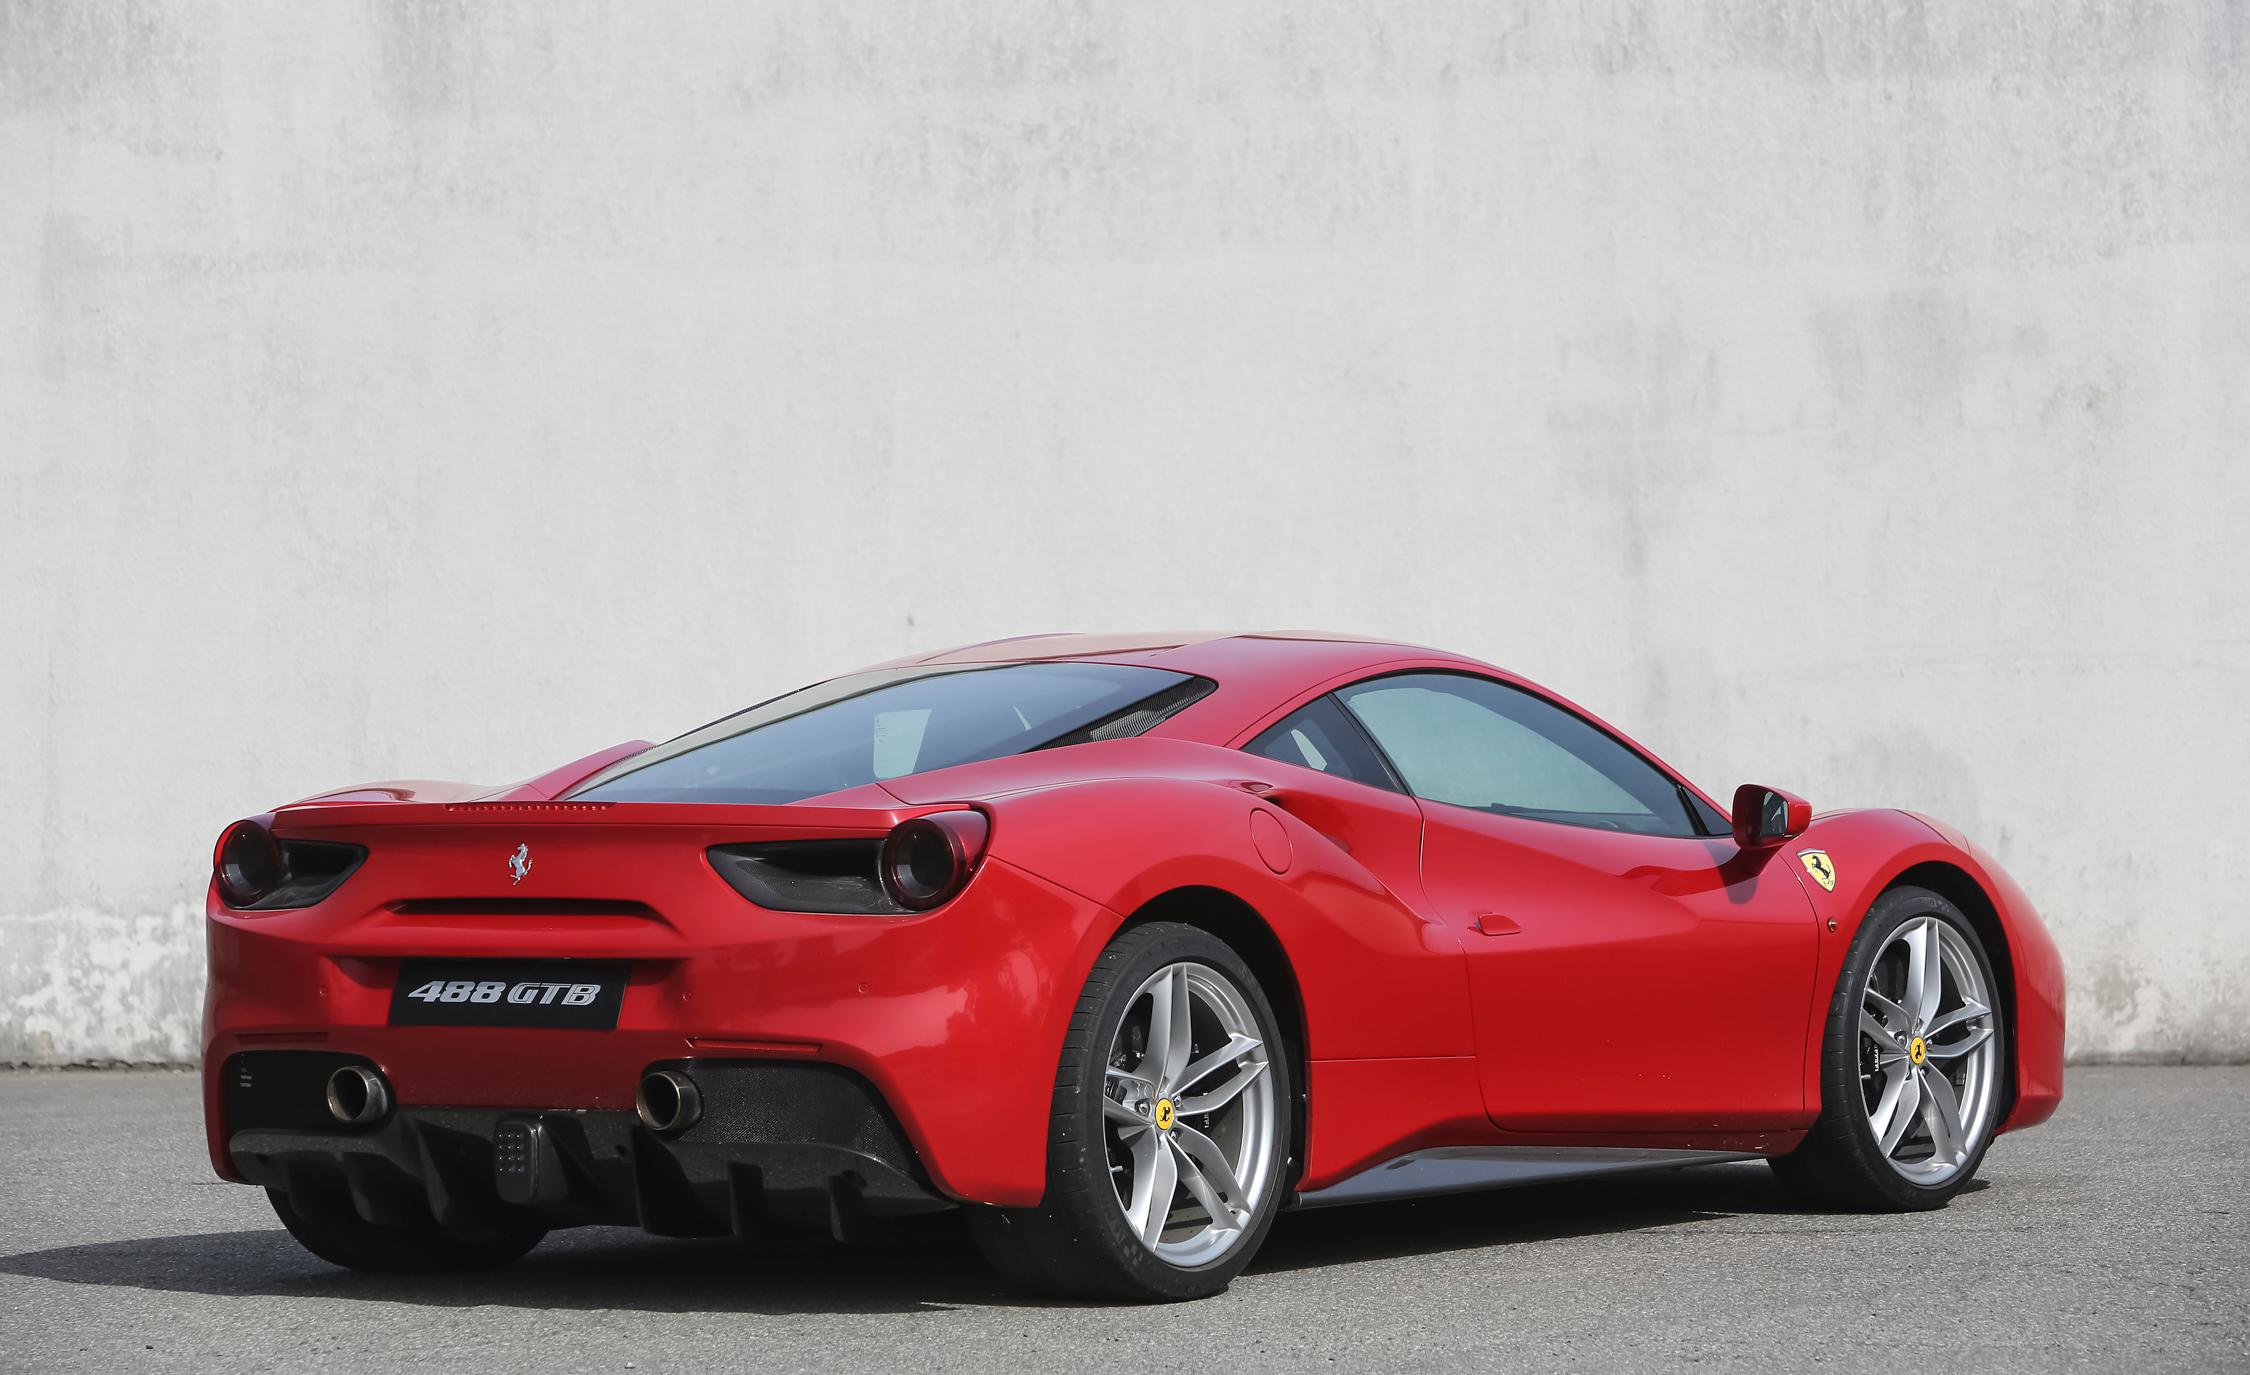 2016 Ferrari 488GTB Exterior Full Rear and Side